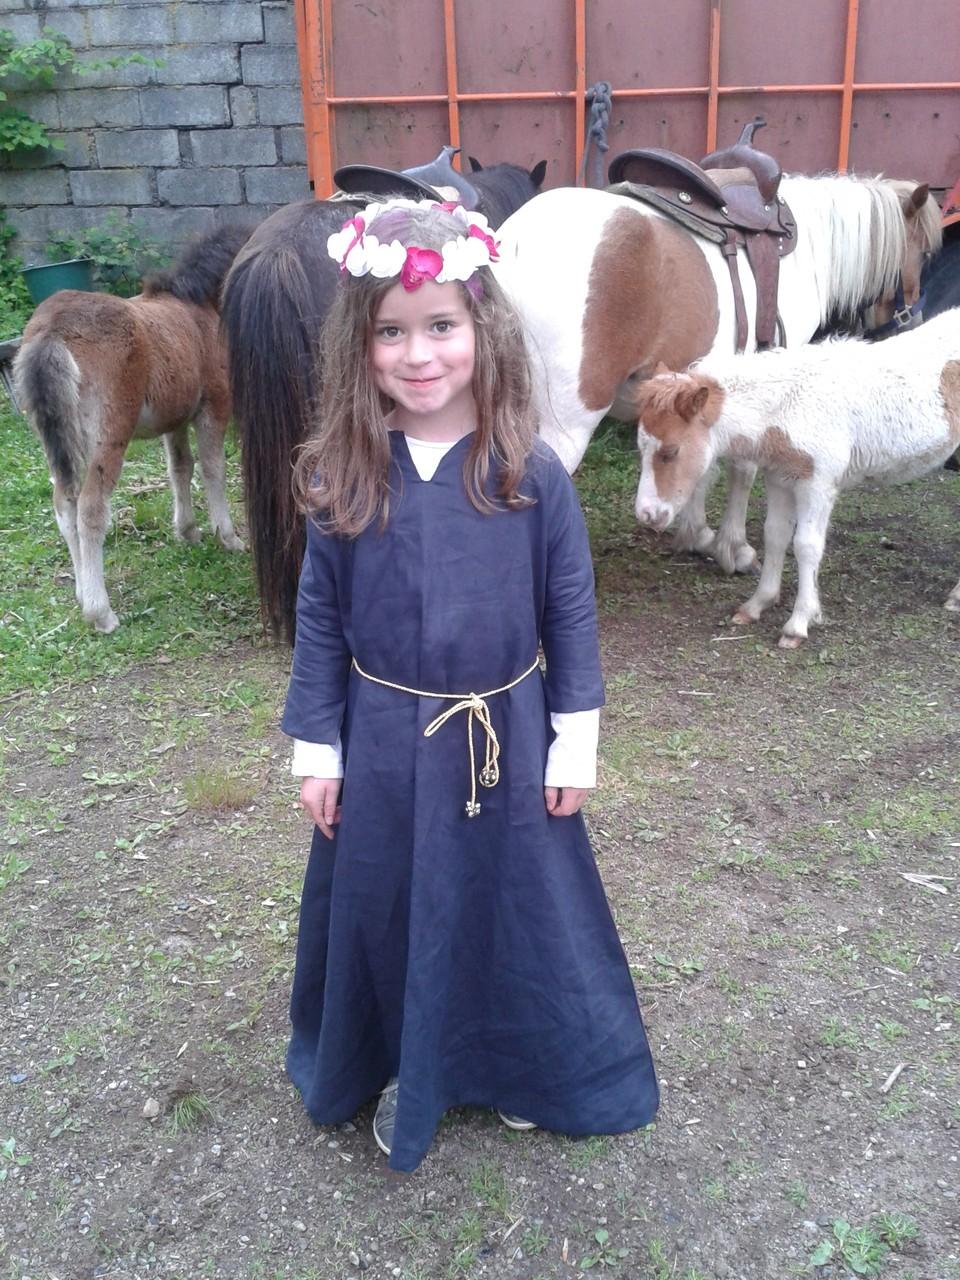 Robe médiévale enfant - Médiévales de Murol 2014 - Nathalie Navarro Créations